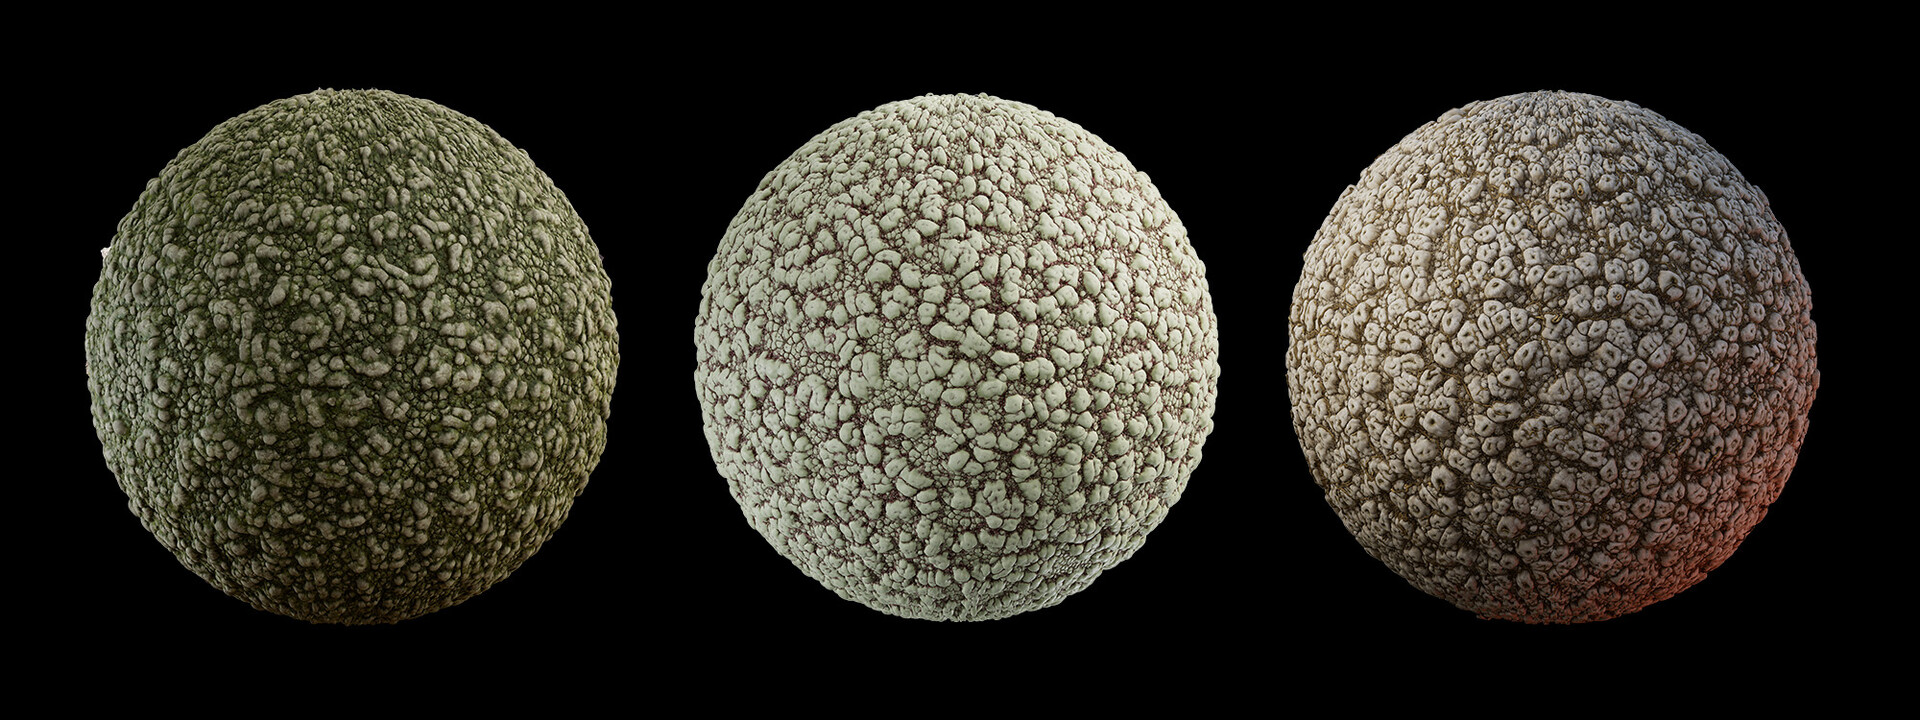 Ben wilson decay 3 ball